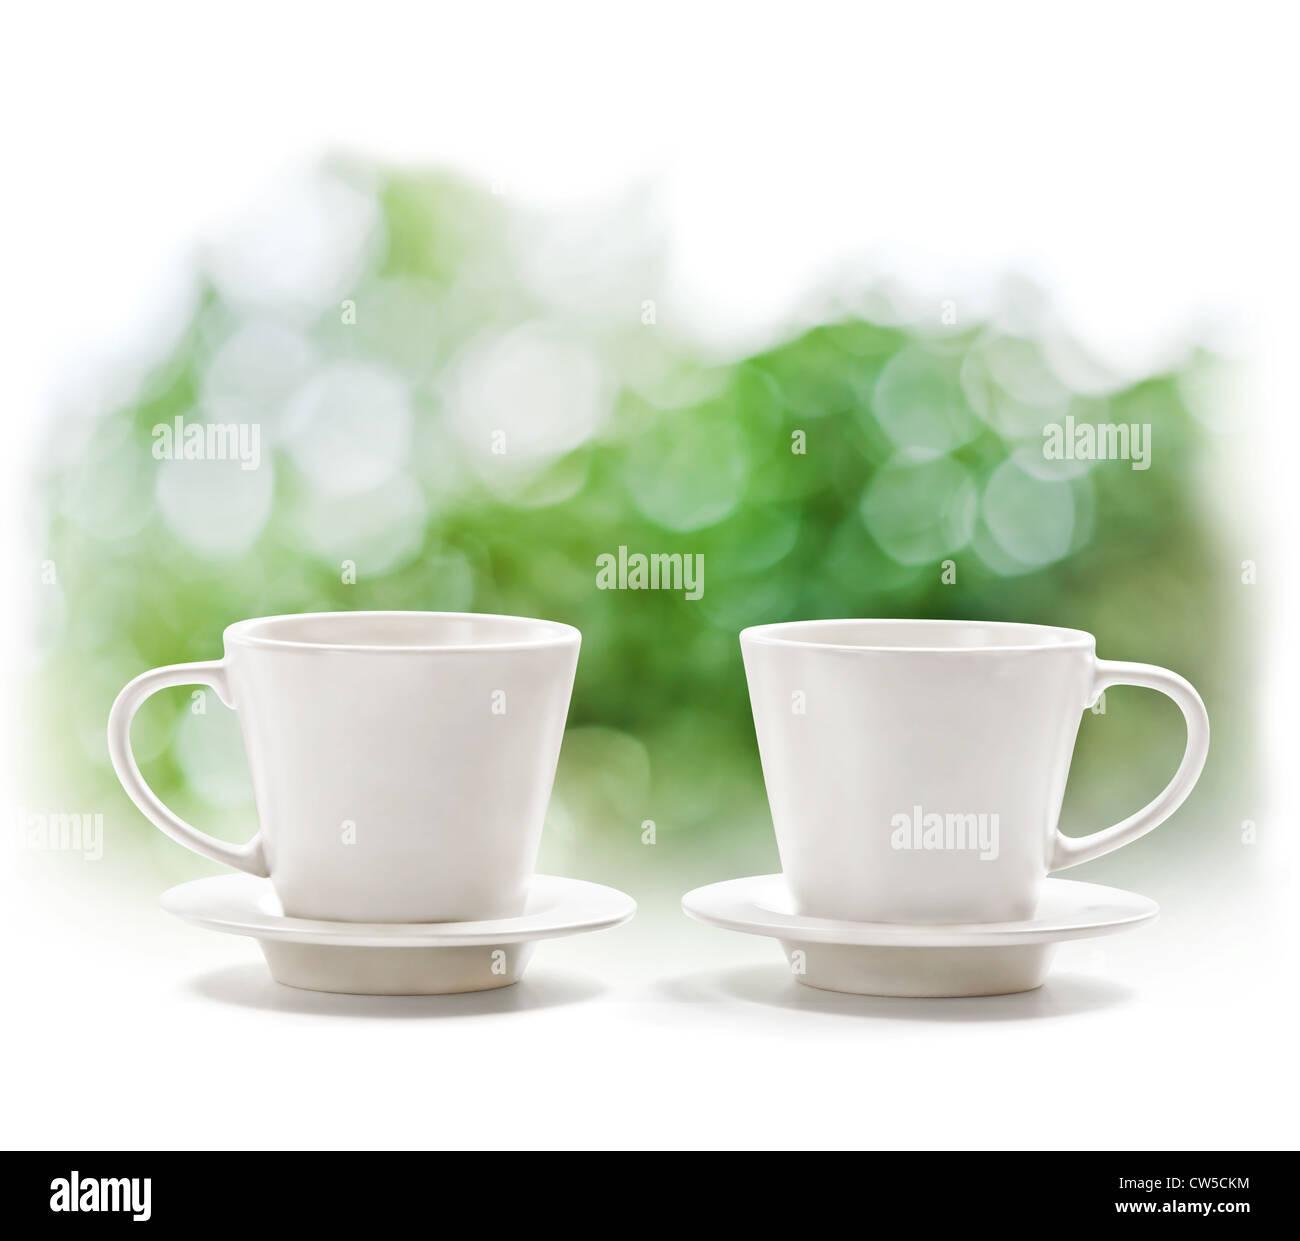 Cups on defocus summer background - Stock Image